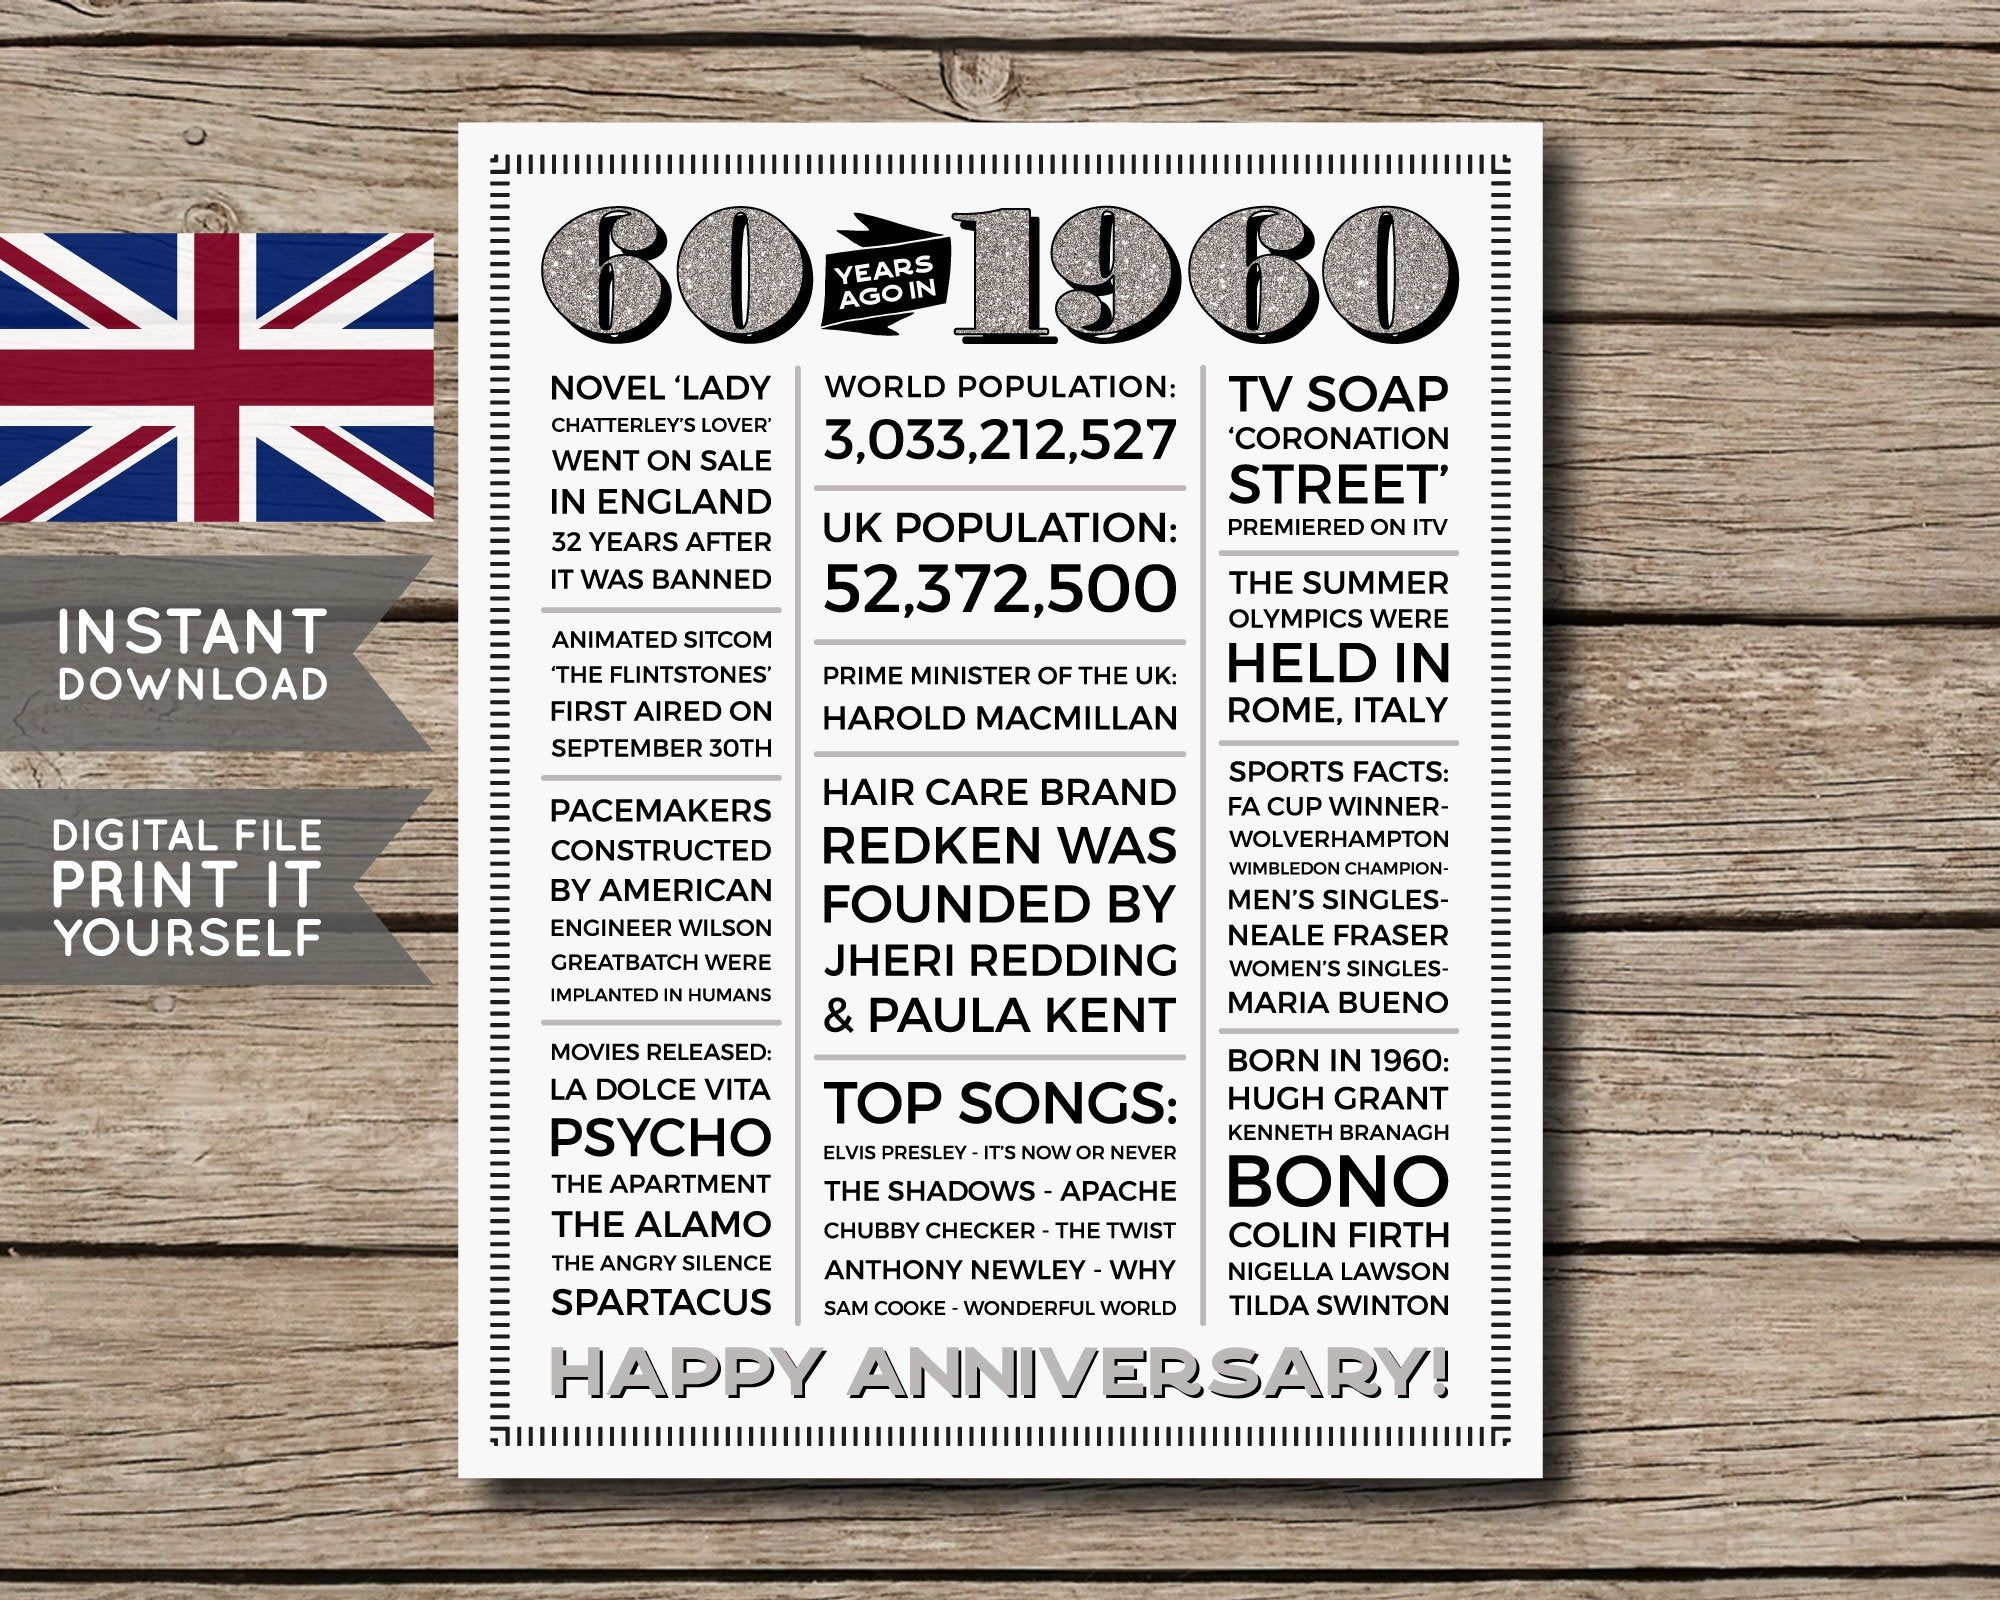 UK 60th Anniversary Poster, 60th Anniversary Gift, 60th